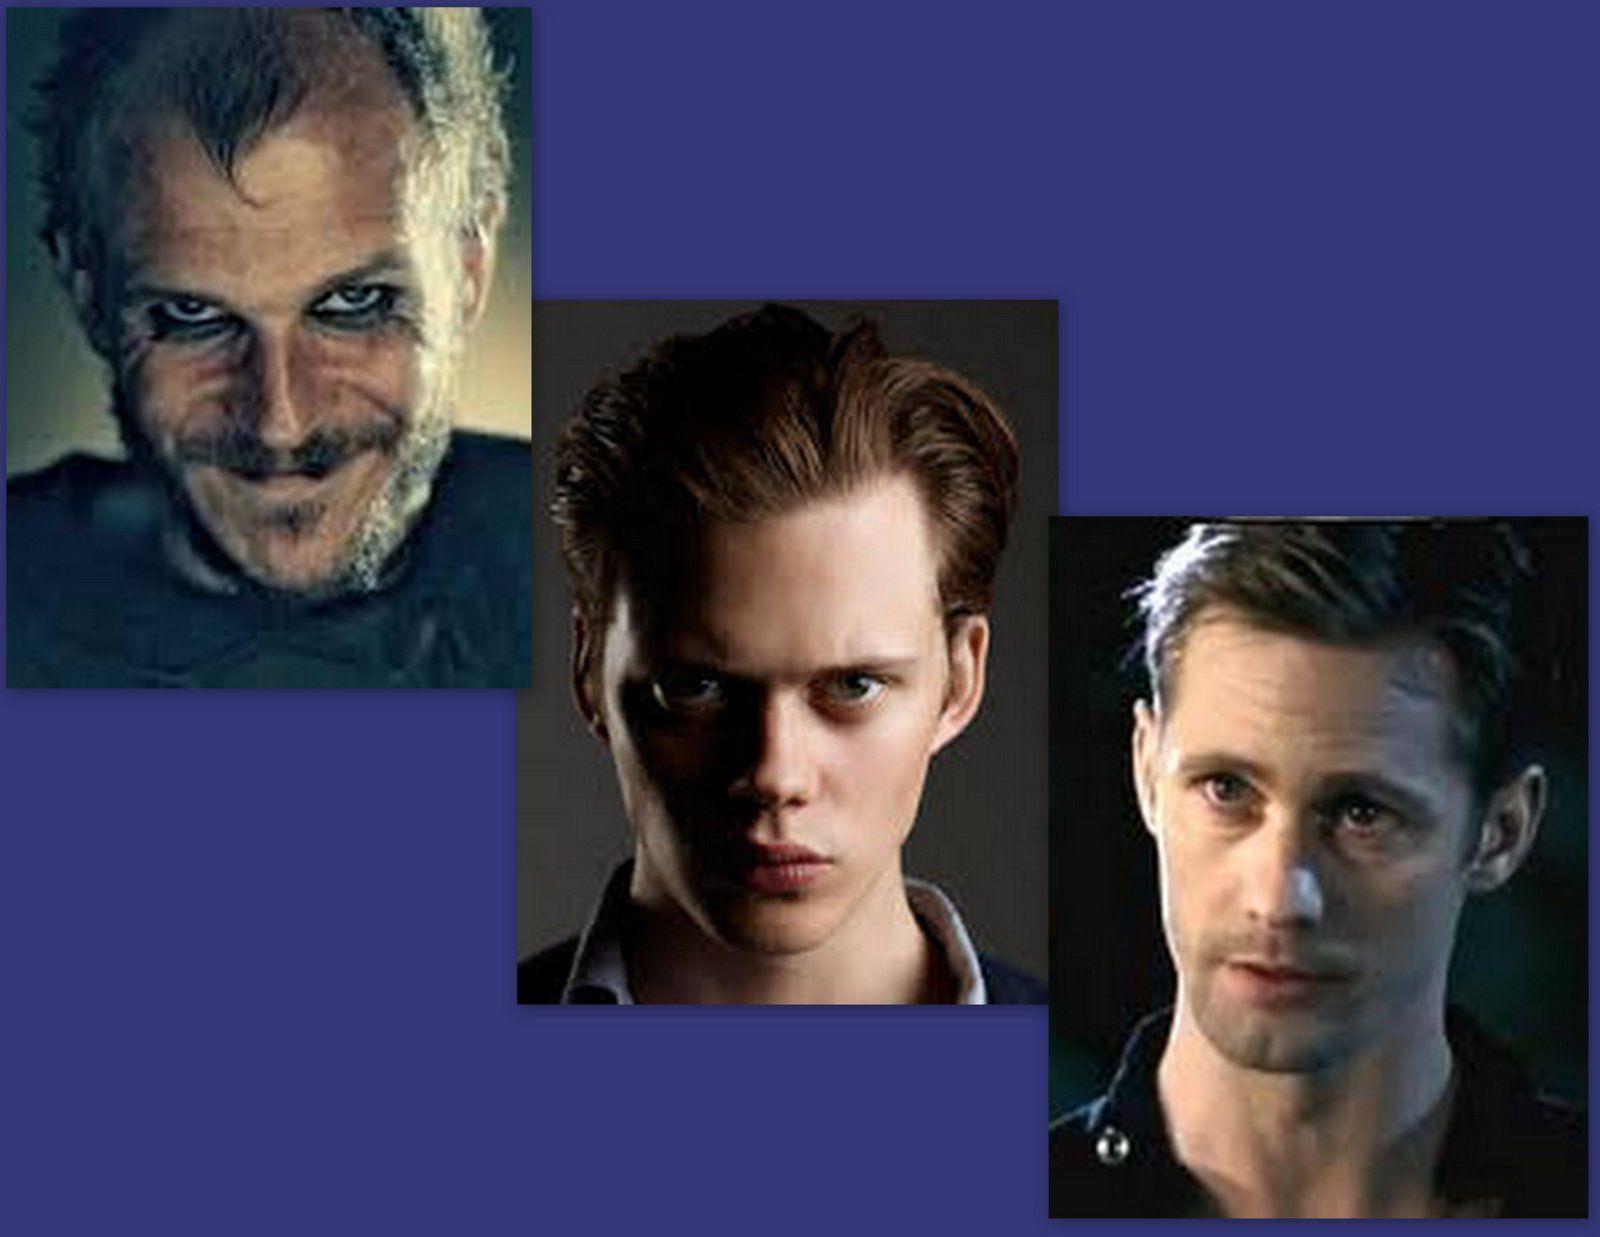 A Viking, a Vampire, & a Viking Vampire - the Skarsgard Brothers - Gustaf (Vikings), Bill (Hemlock Grove), & Alexander (True Blood)